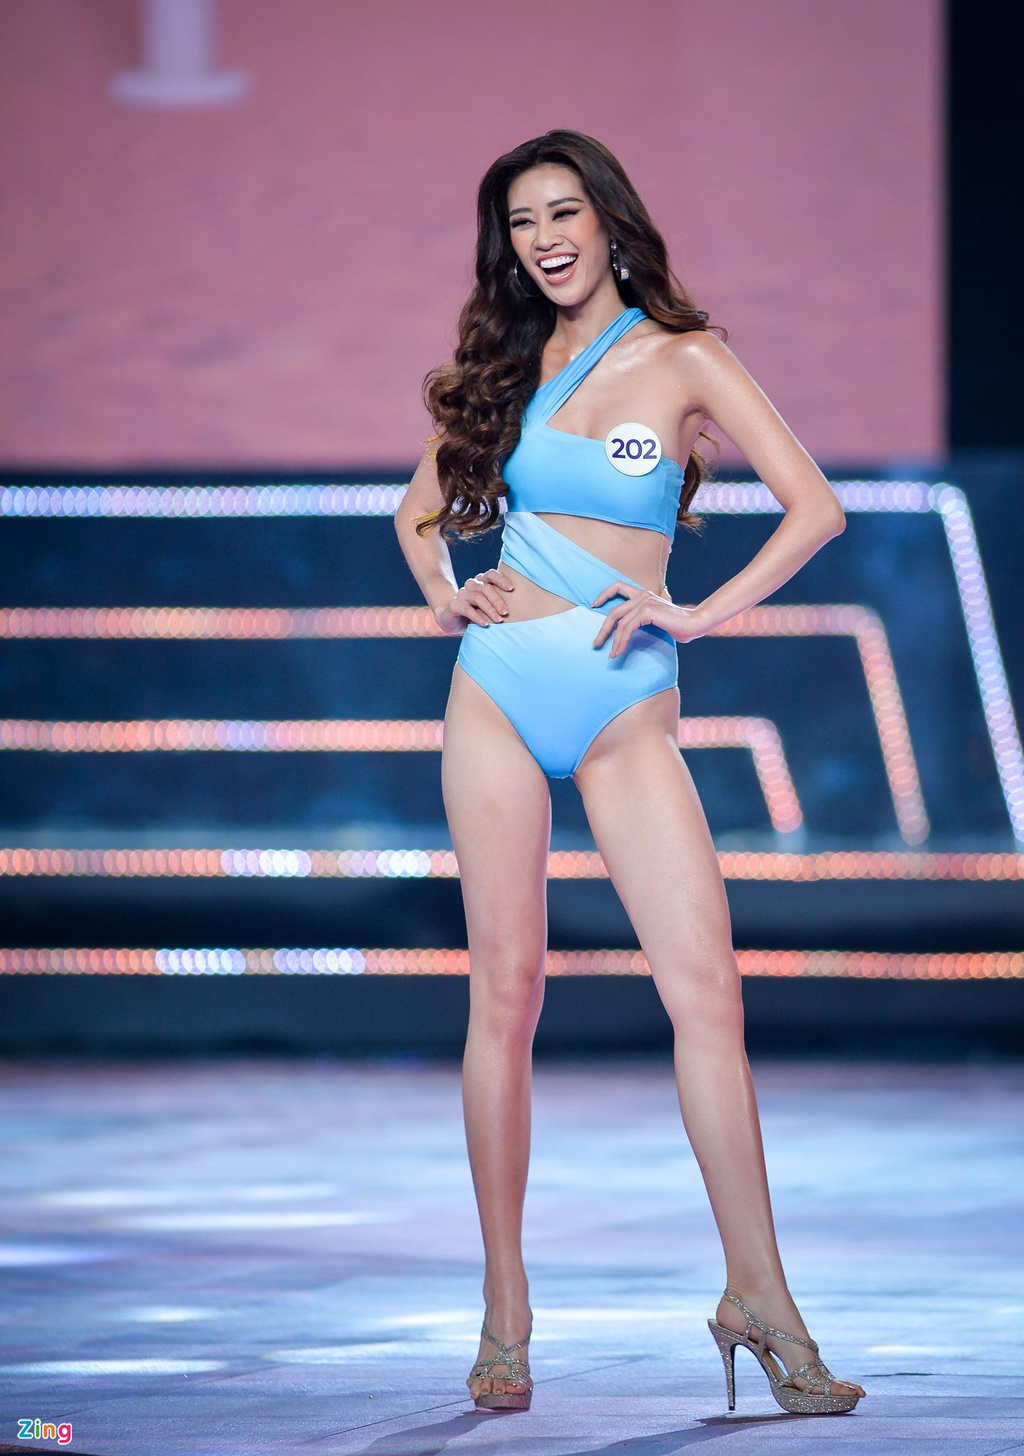 Dan thi sinh Hoa hau Hoan vu goi cam voi bikini hinh anh 11